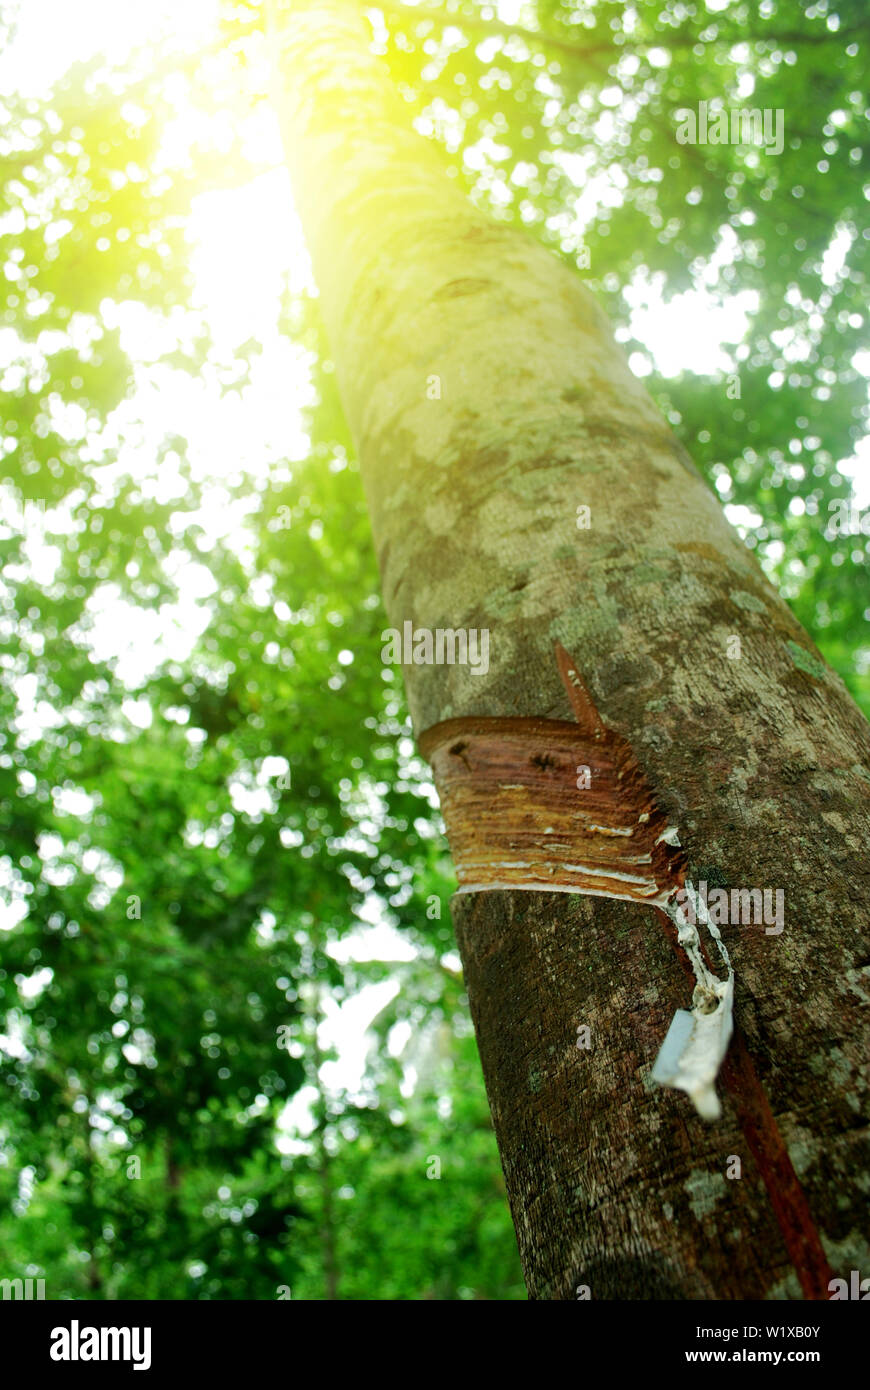 Rubber plantation in Thailand Abundant. Rubber production. - Stock Image